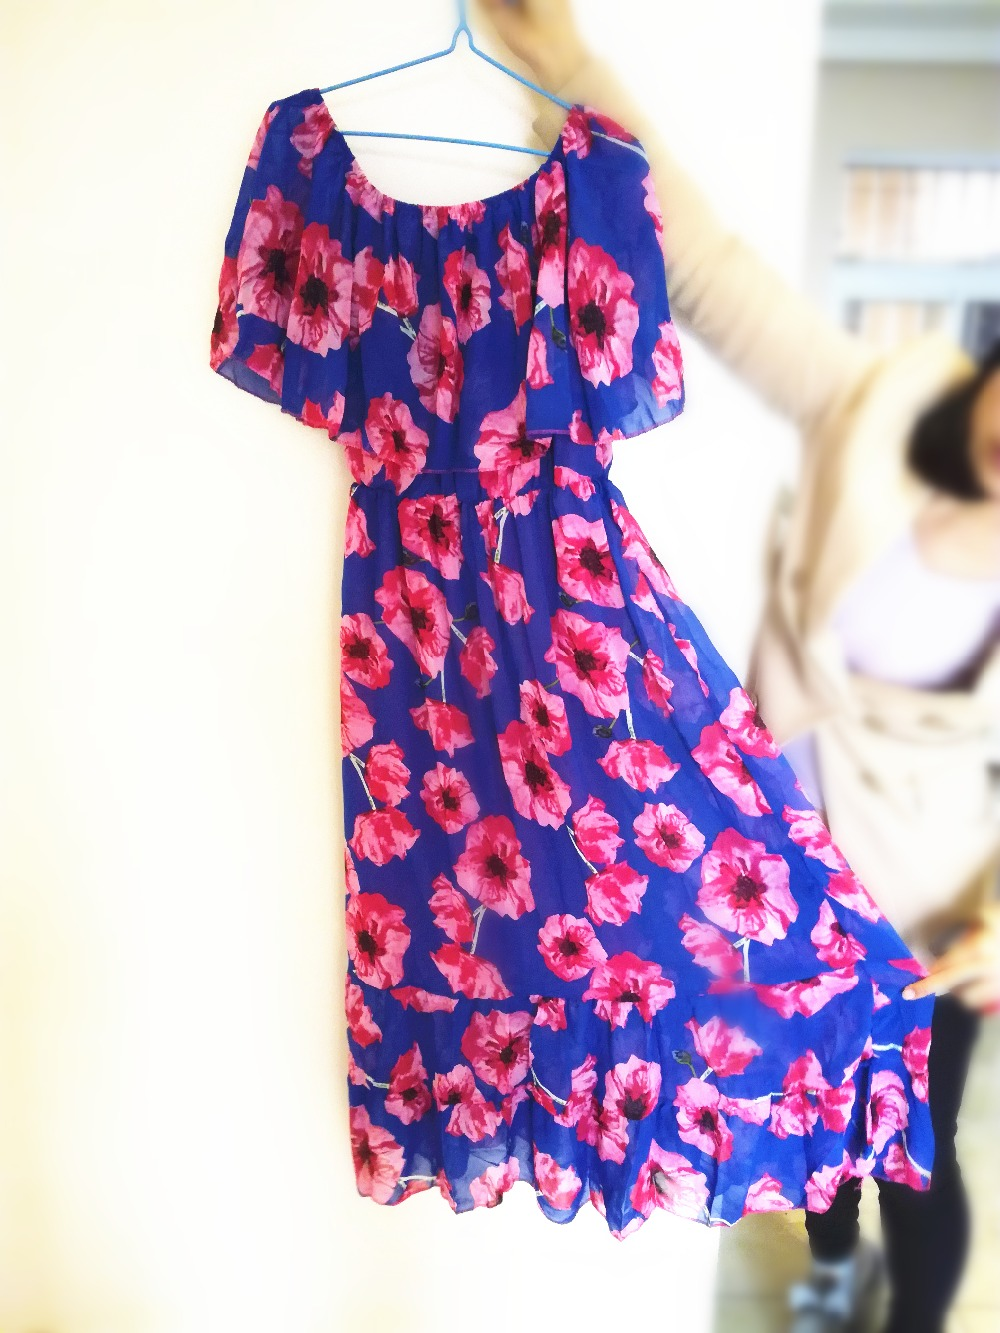 67b98347707 Plus Size summer dress 2019 Bohemian robe Sexy Off Shoulder Ruffle floral  maxi dress women casual boho chiffon beach dress-in Dresses from Women s  Clothing ...